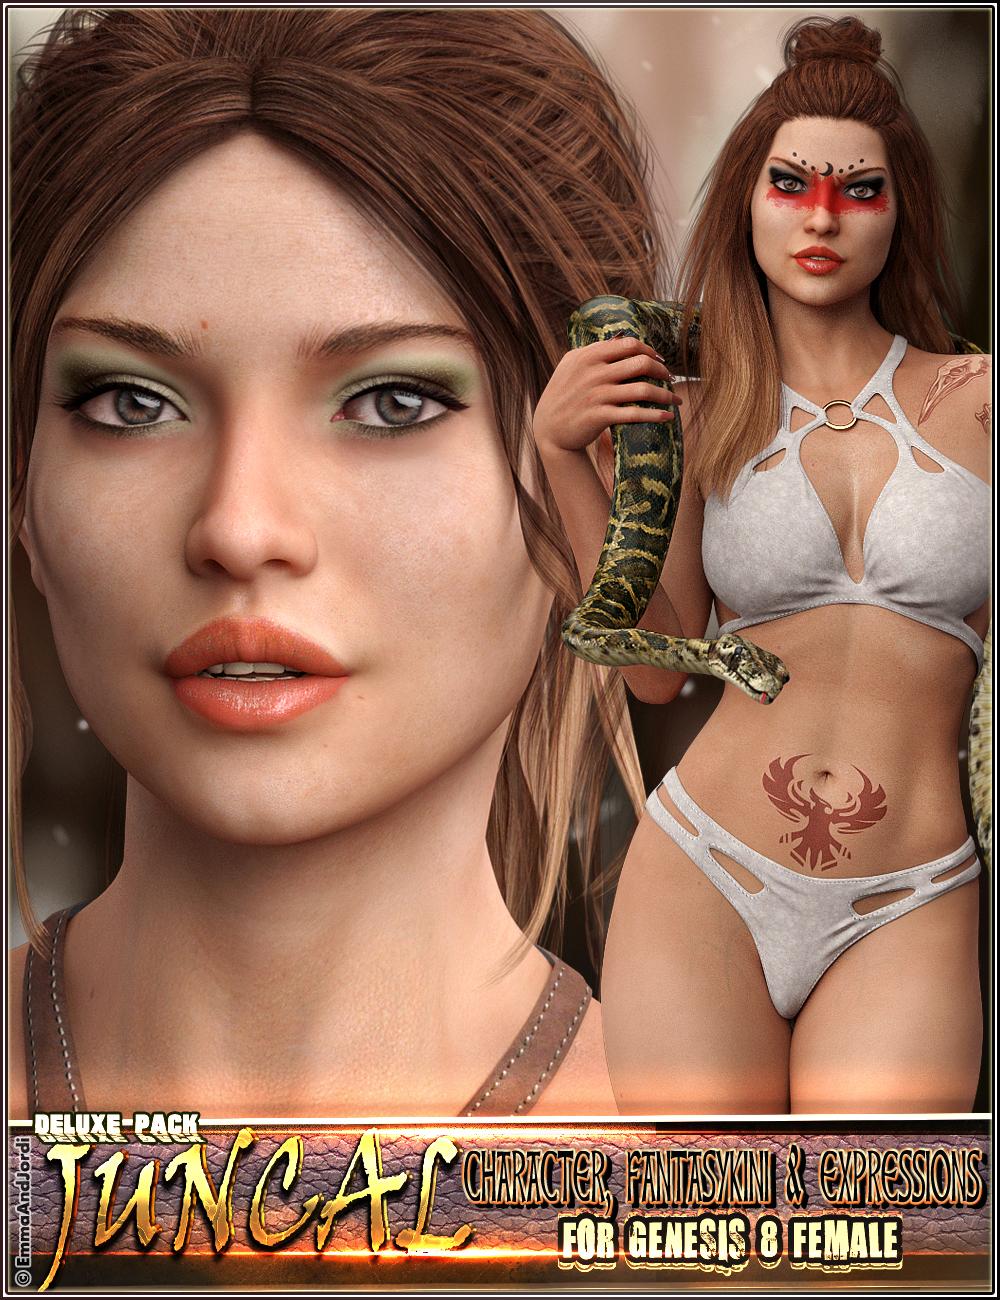 EJ Juncal Deluxe Pack for Genesis 8 Female: Character, Fantasykini and Expressions by: EmmaAndJordi, 3D Models by Daz 3D